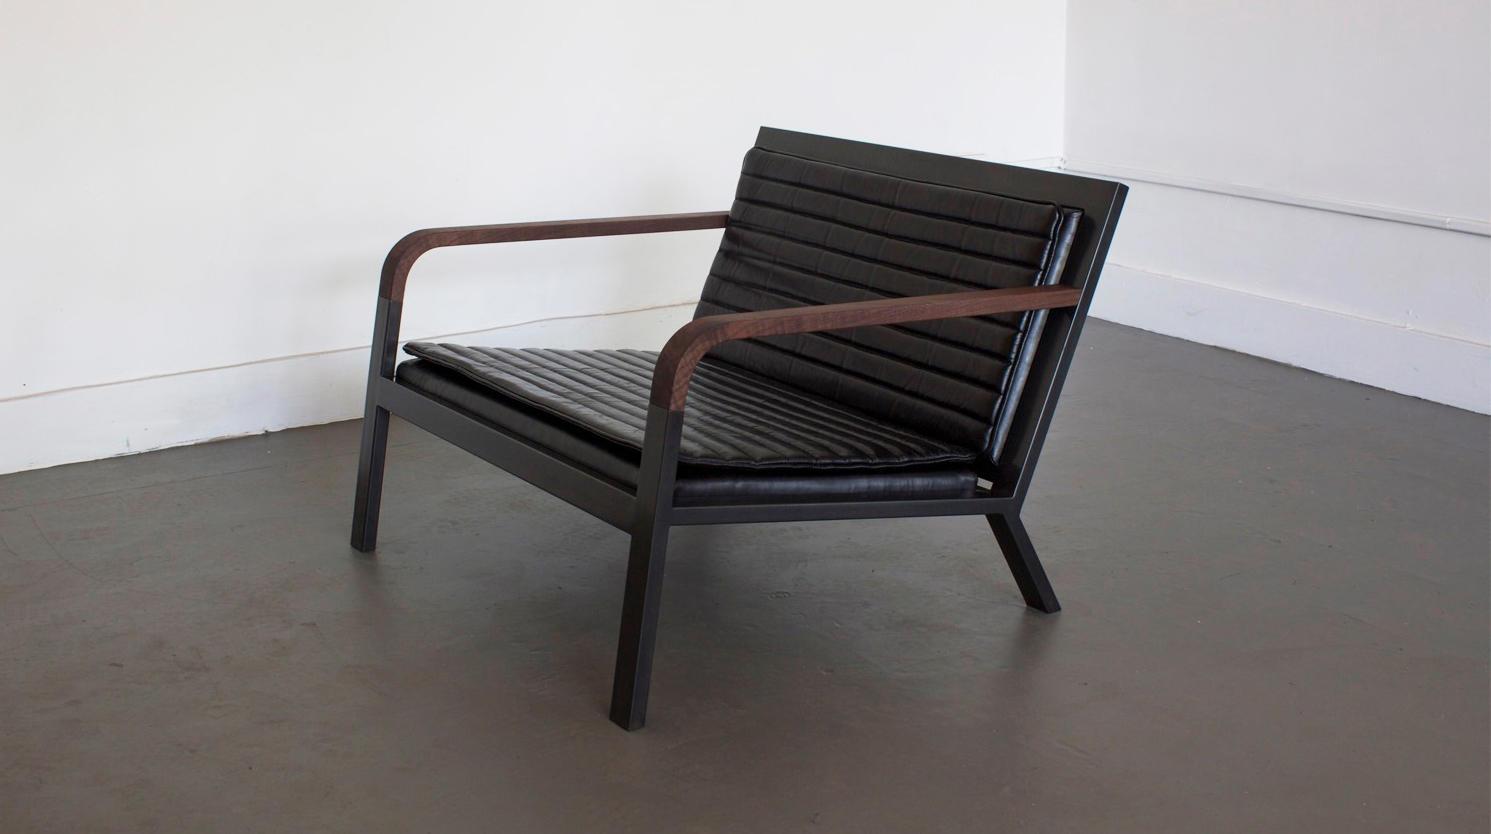 Architonic & DK CHAIR - Armchairs from Uhuru Design   Architonic